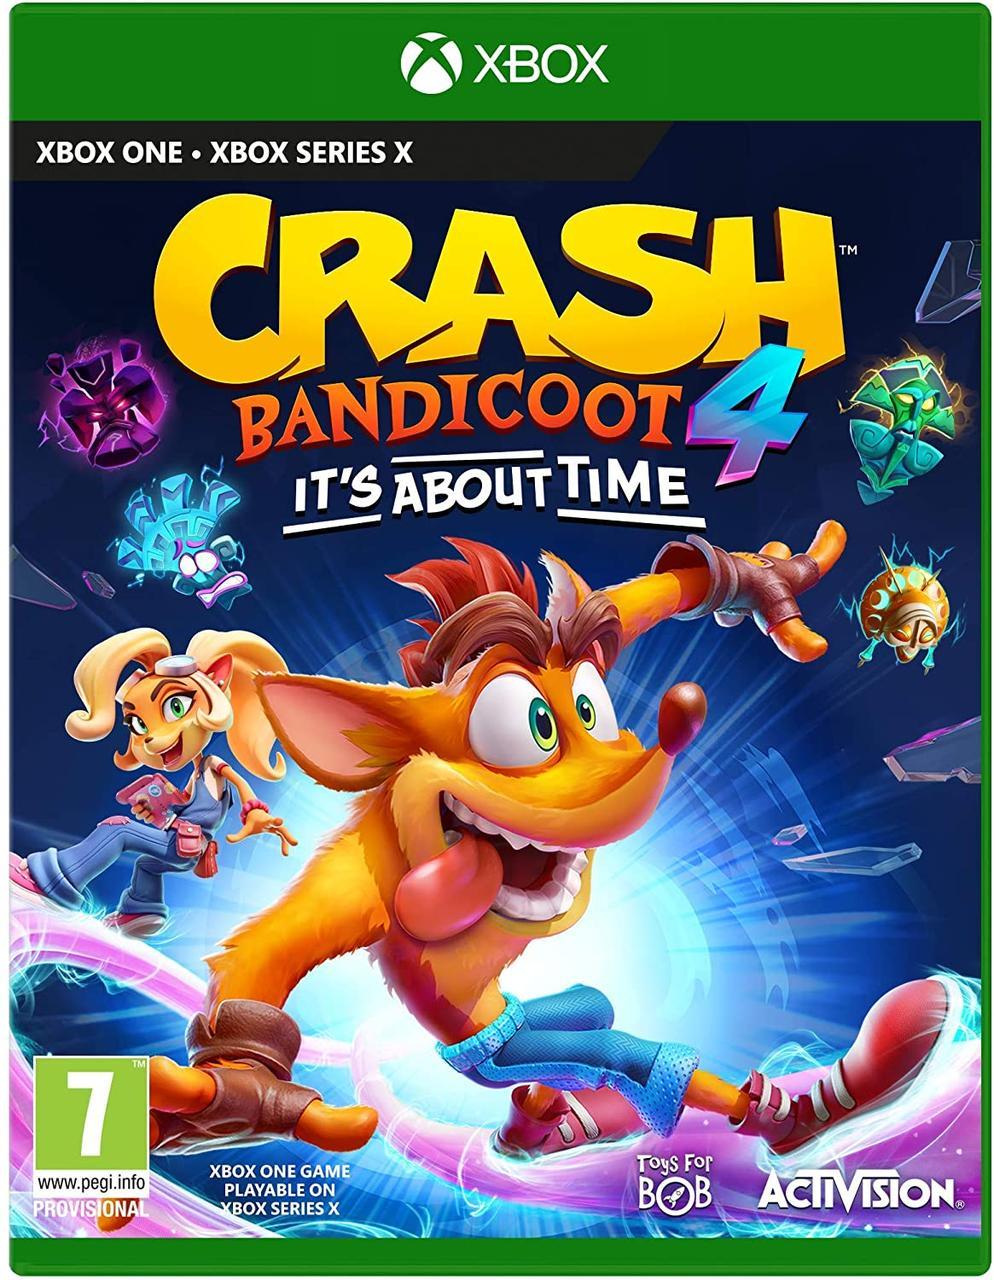 Crash Bandicoot 4: It's About Time (російські субтитри) XBox One